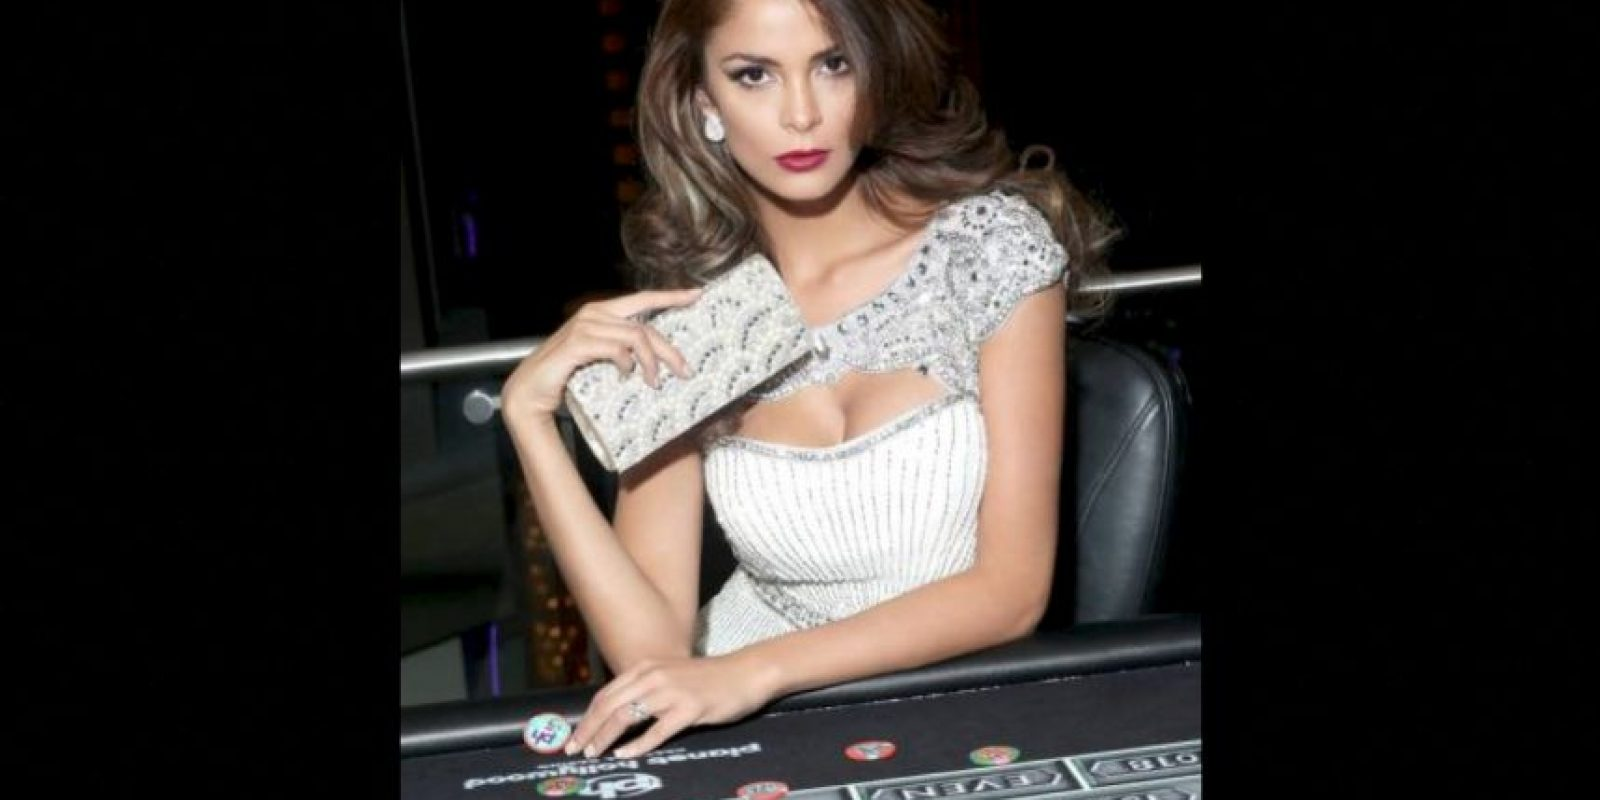 Laura Spoya es Miss Perú Foto:Facebook.com/MissUniverse